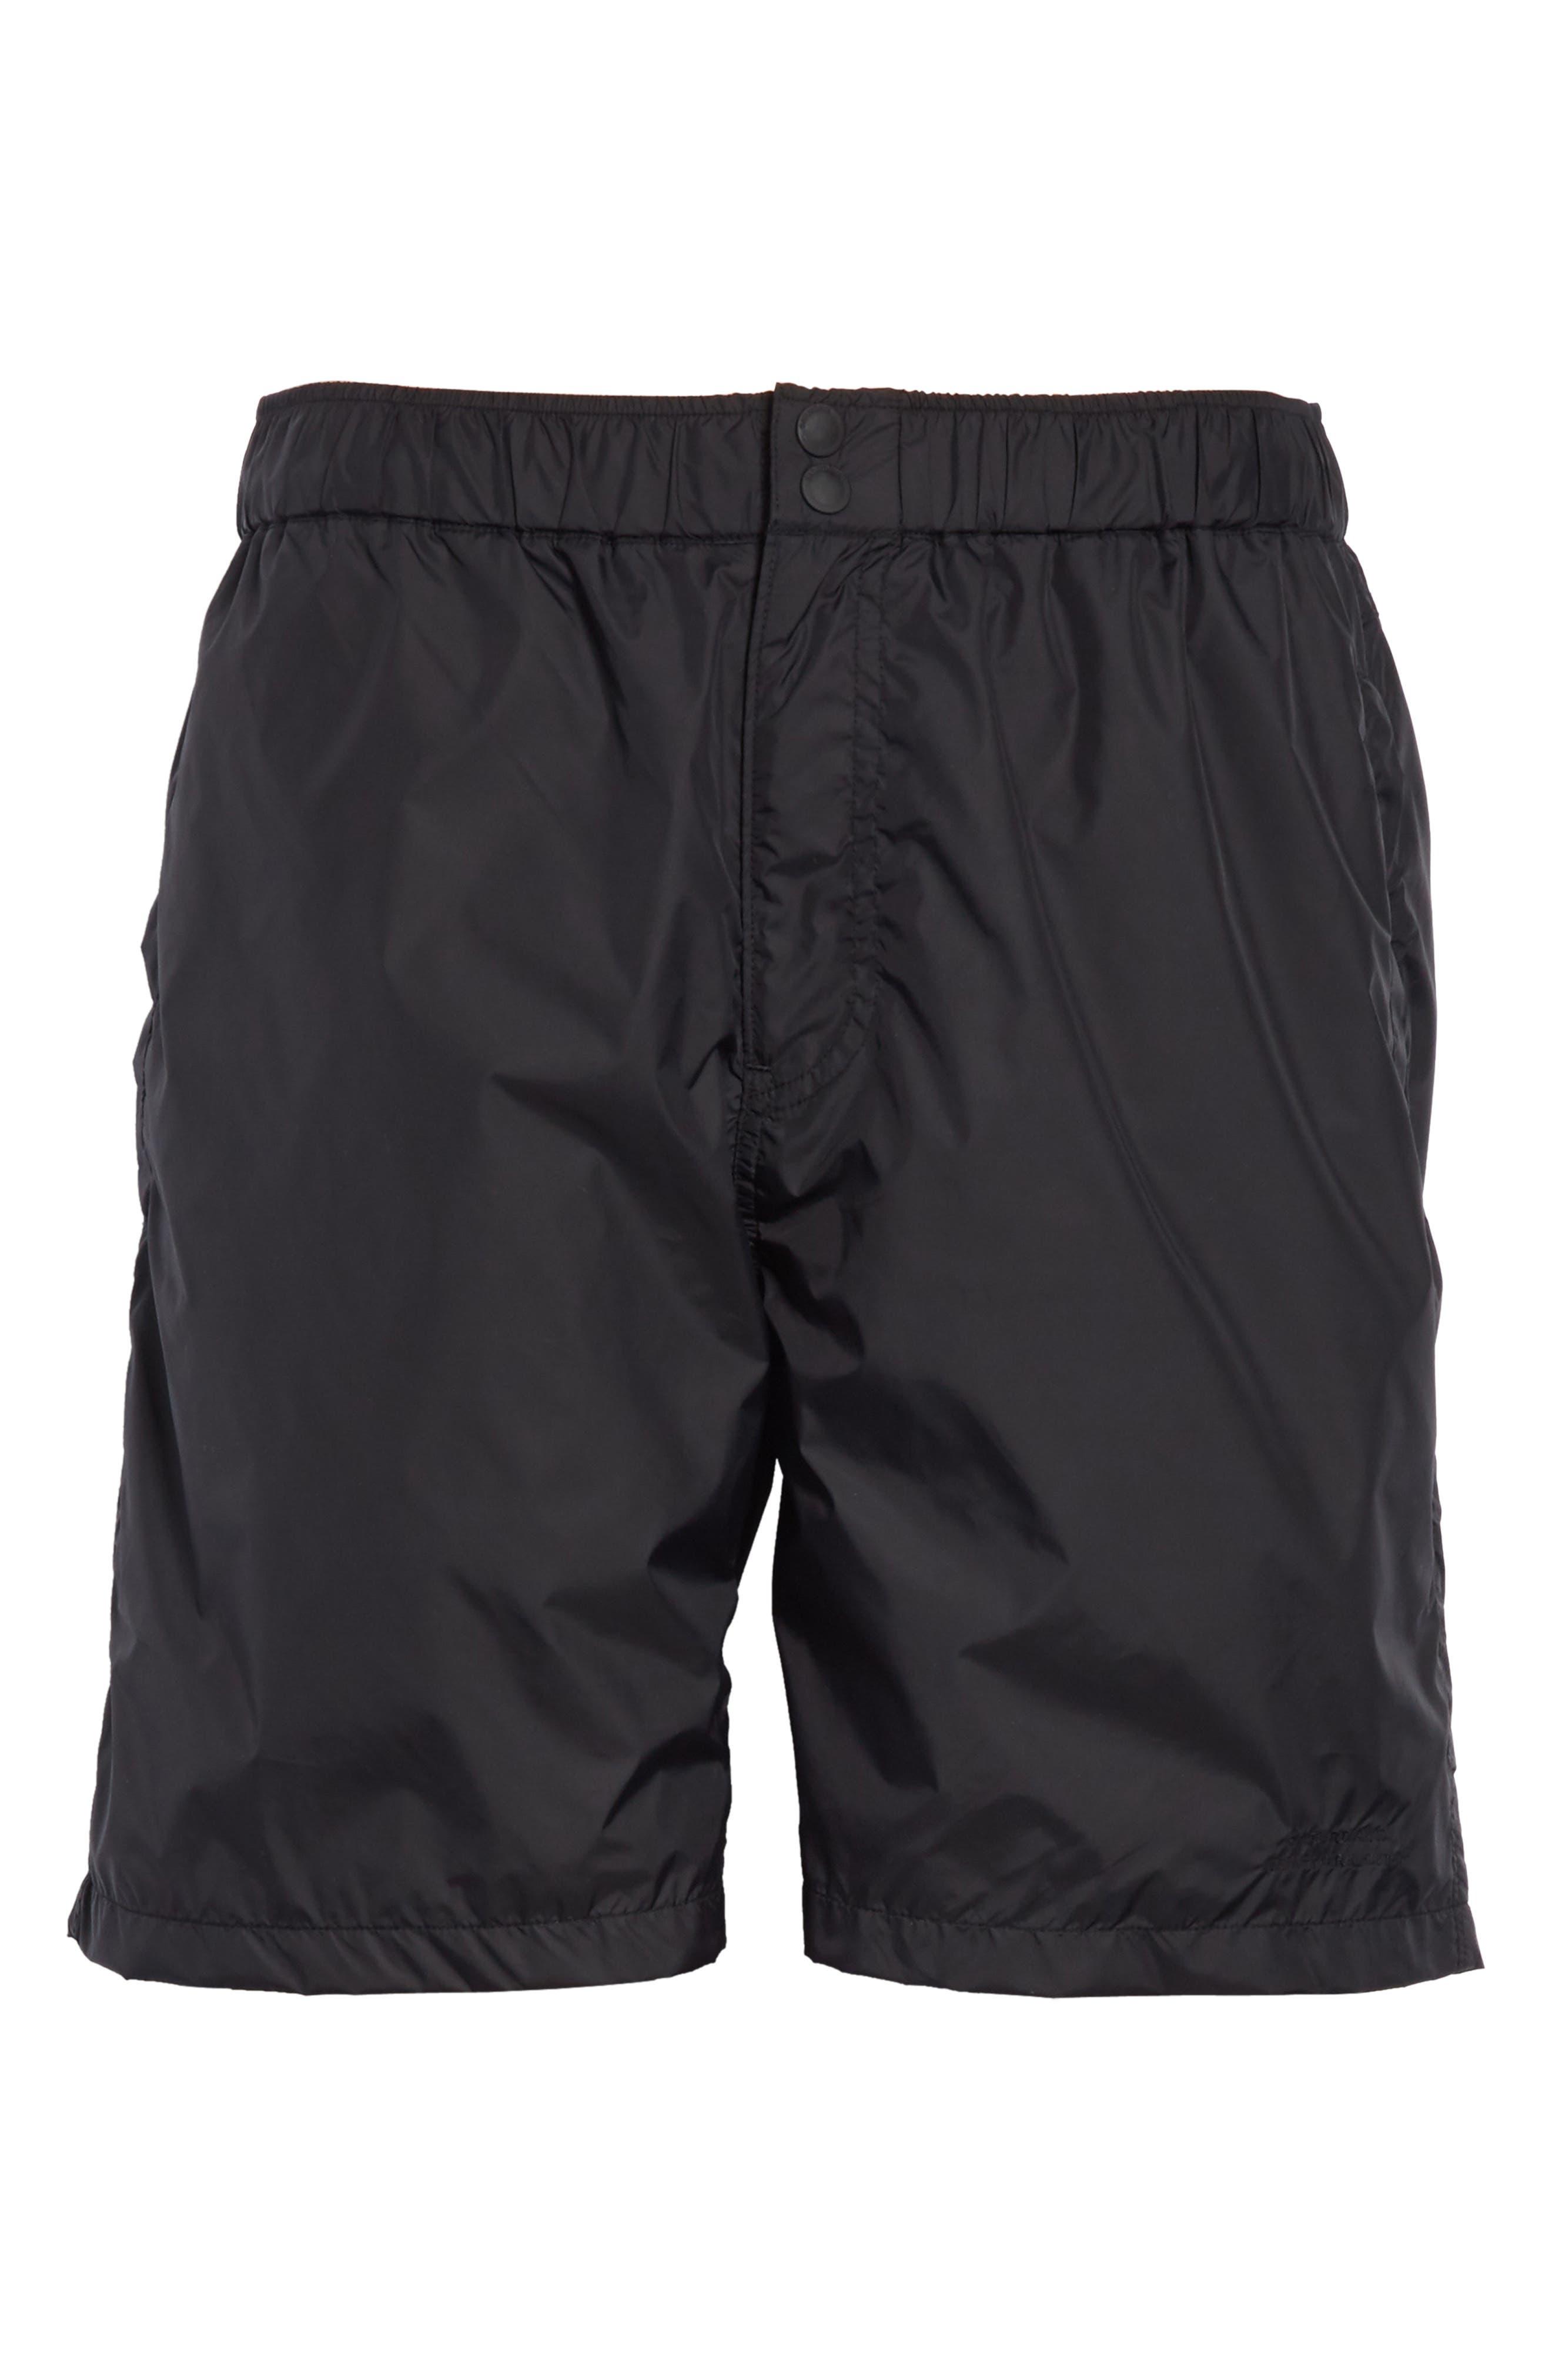 Trent Hybrid Shorts,                             Alternate thumbnail 6, color,                             001